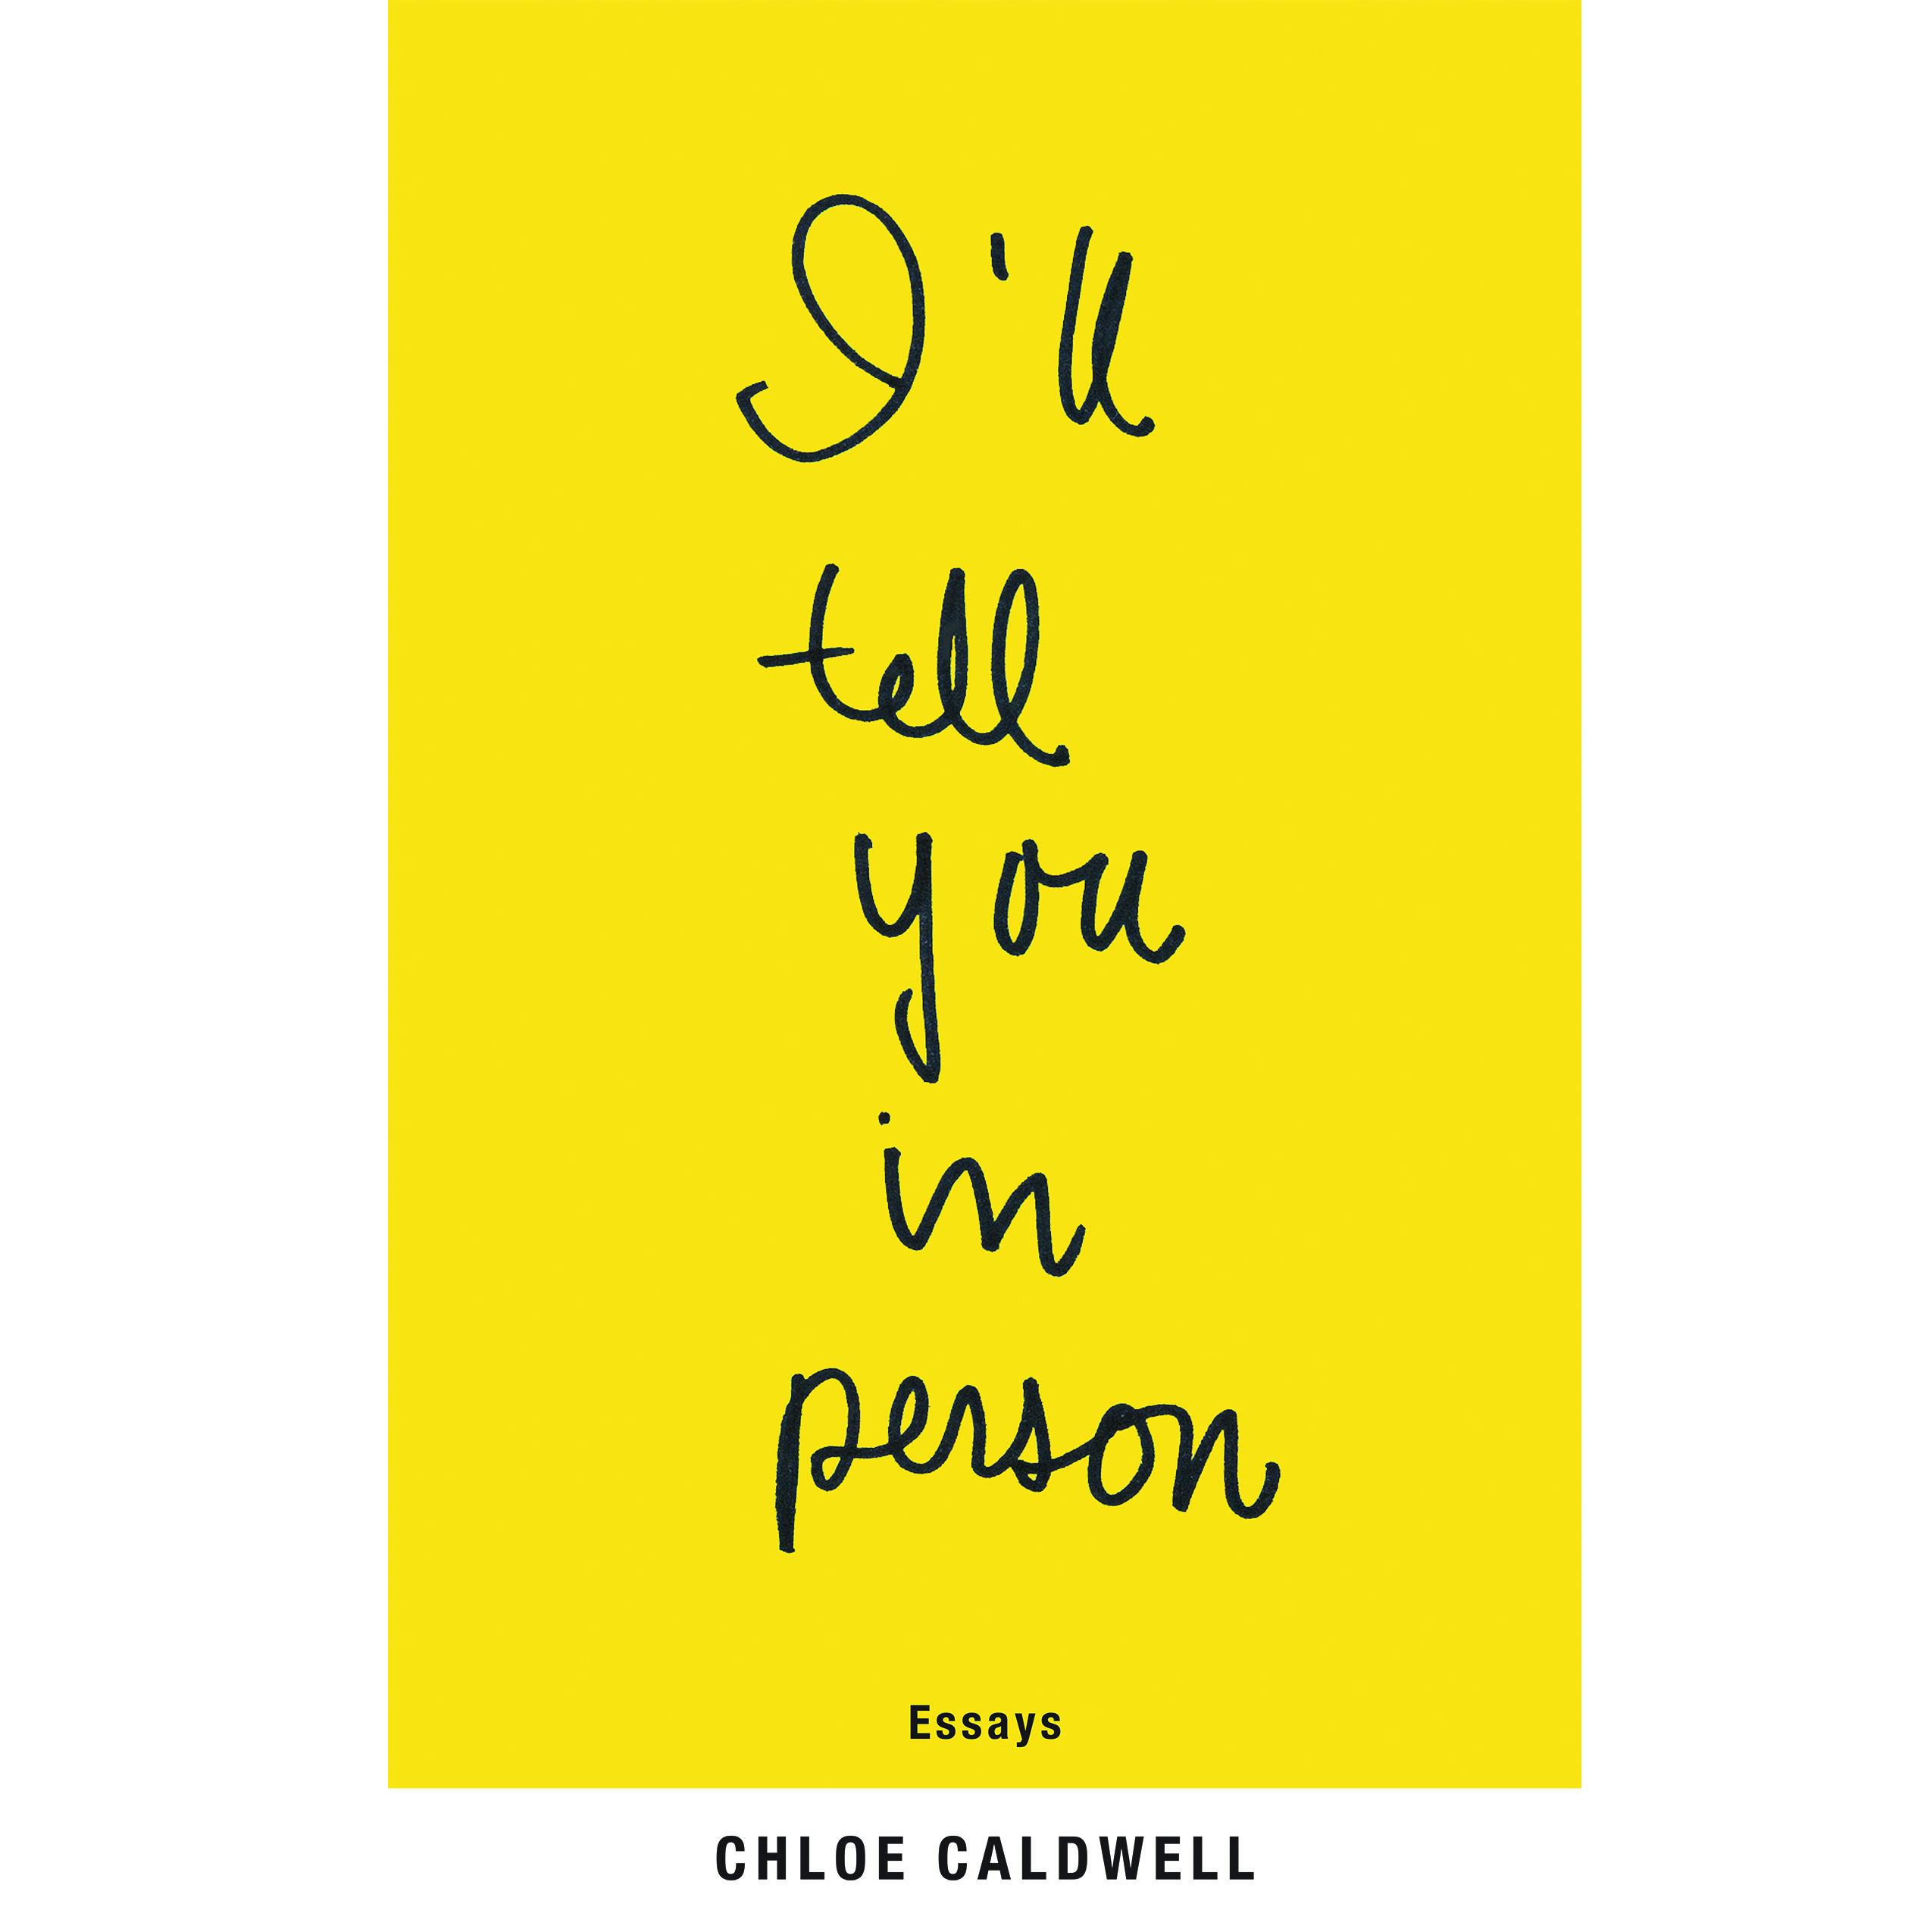 Chloe caldwell luivwq